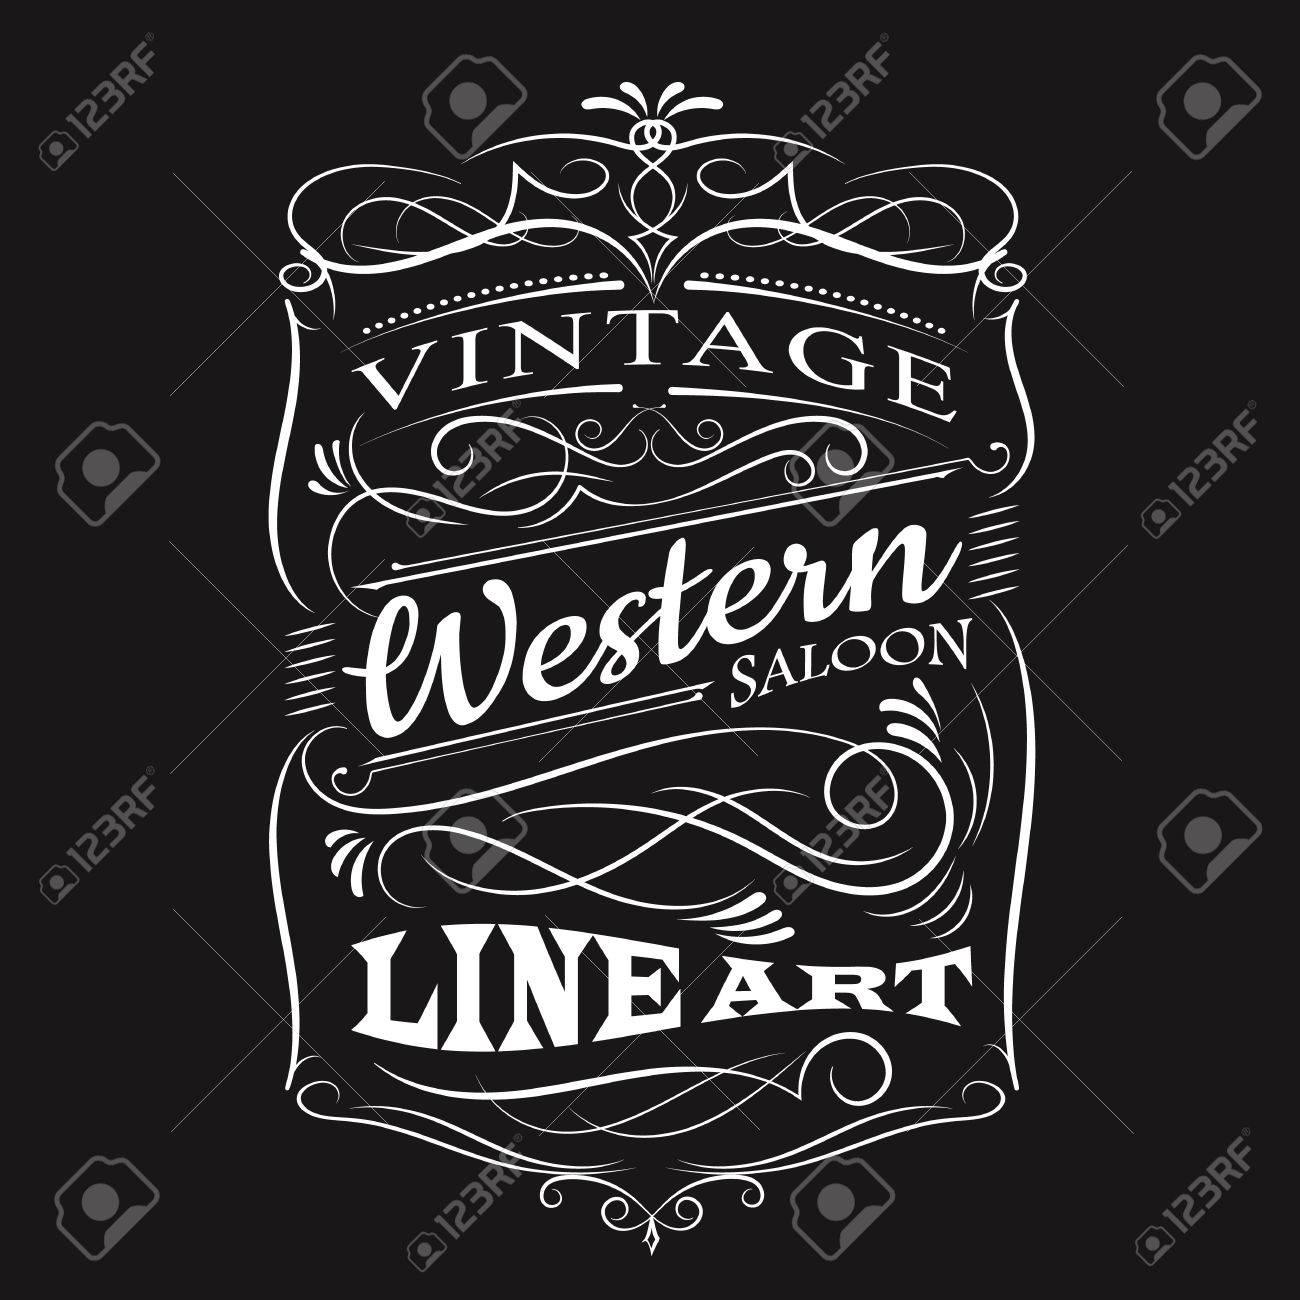 Vintage Label Typography T Shirt Design Vectors Royalty Free